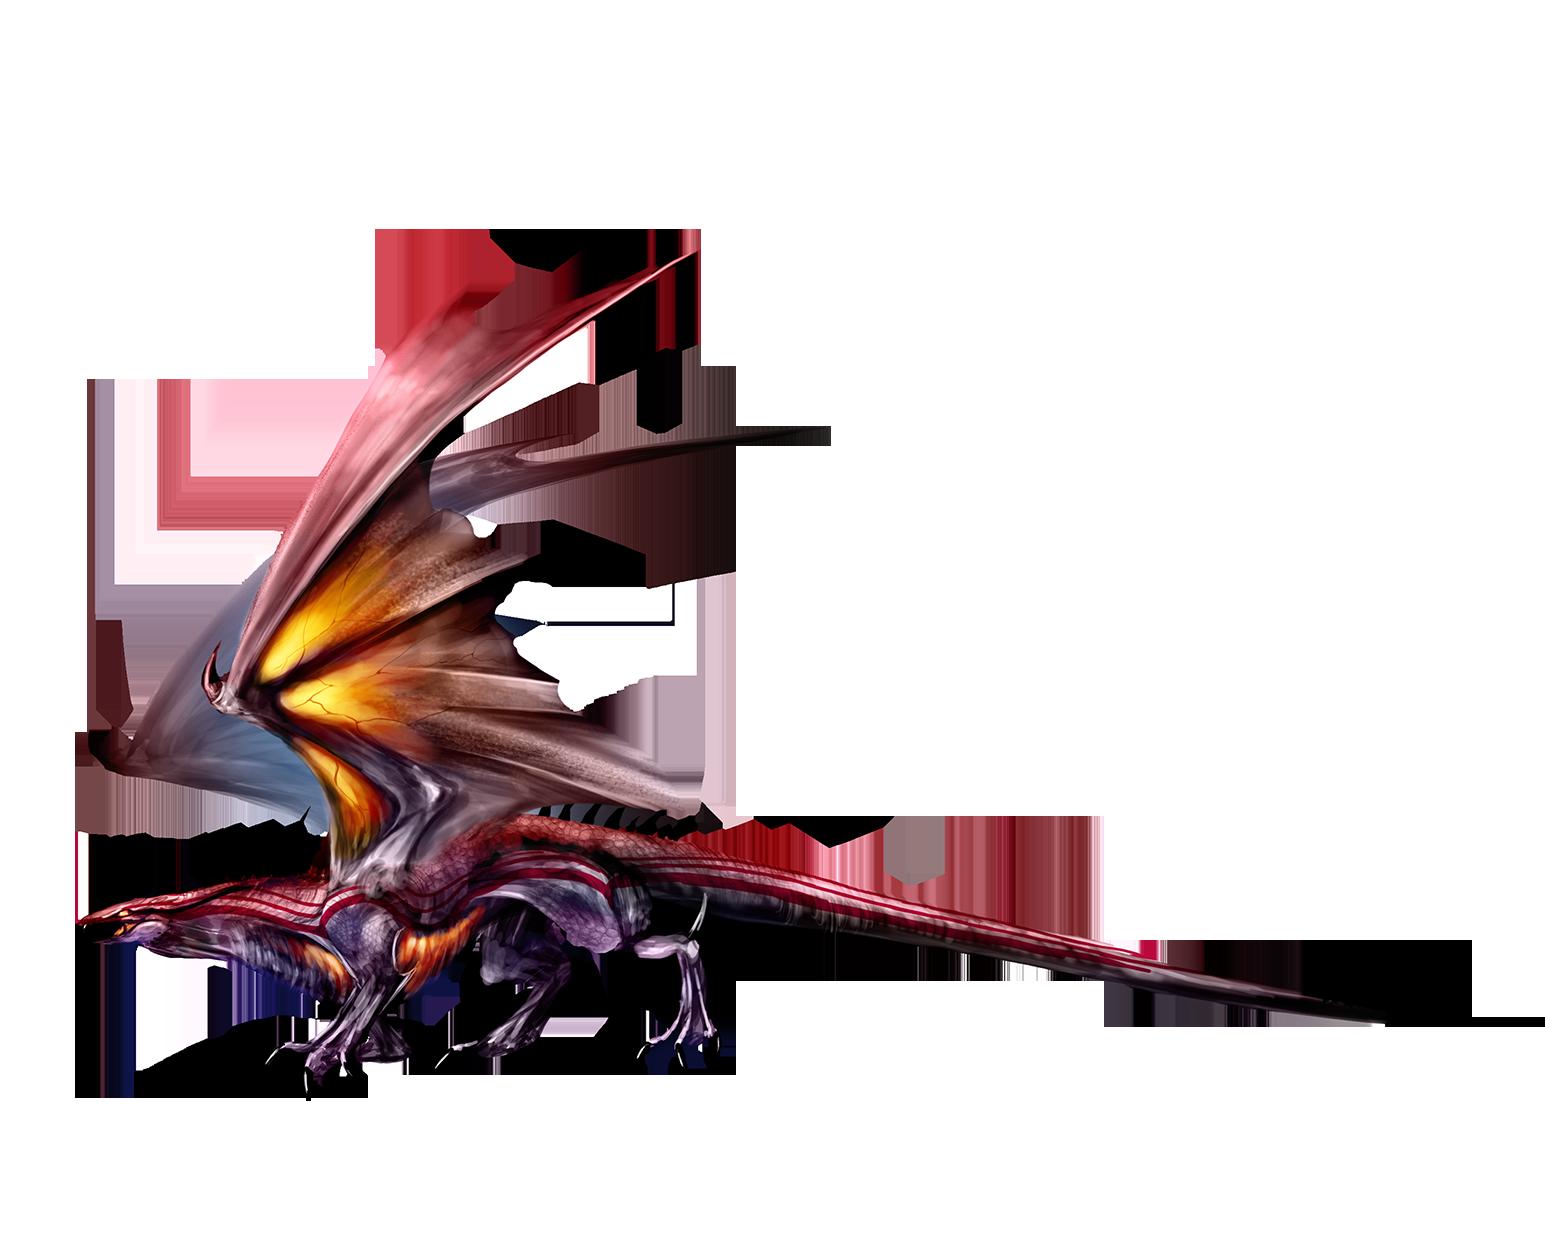 Fire incarnation by Dragolisco